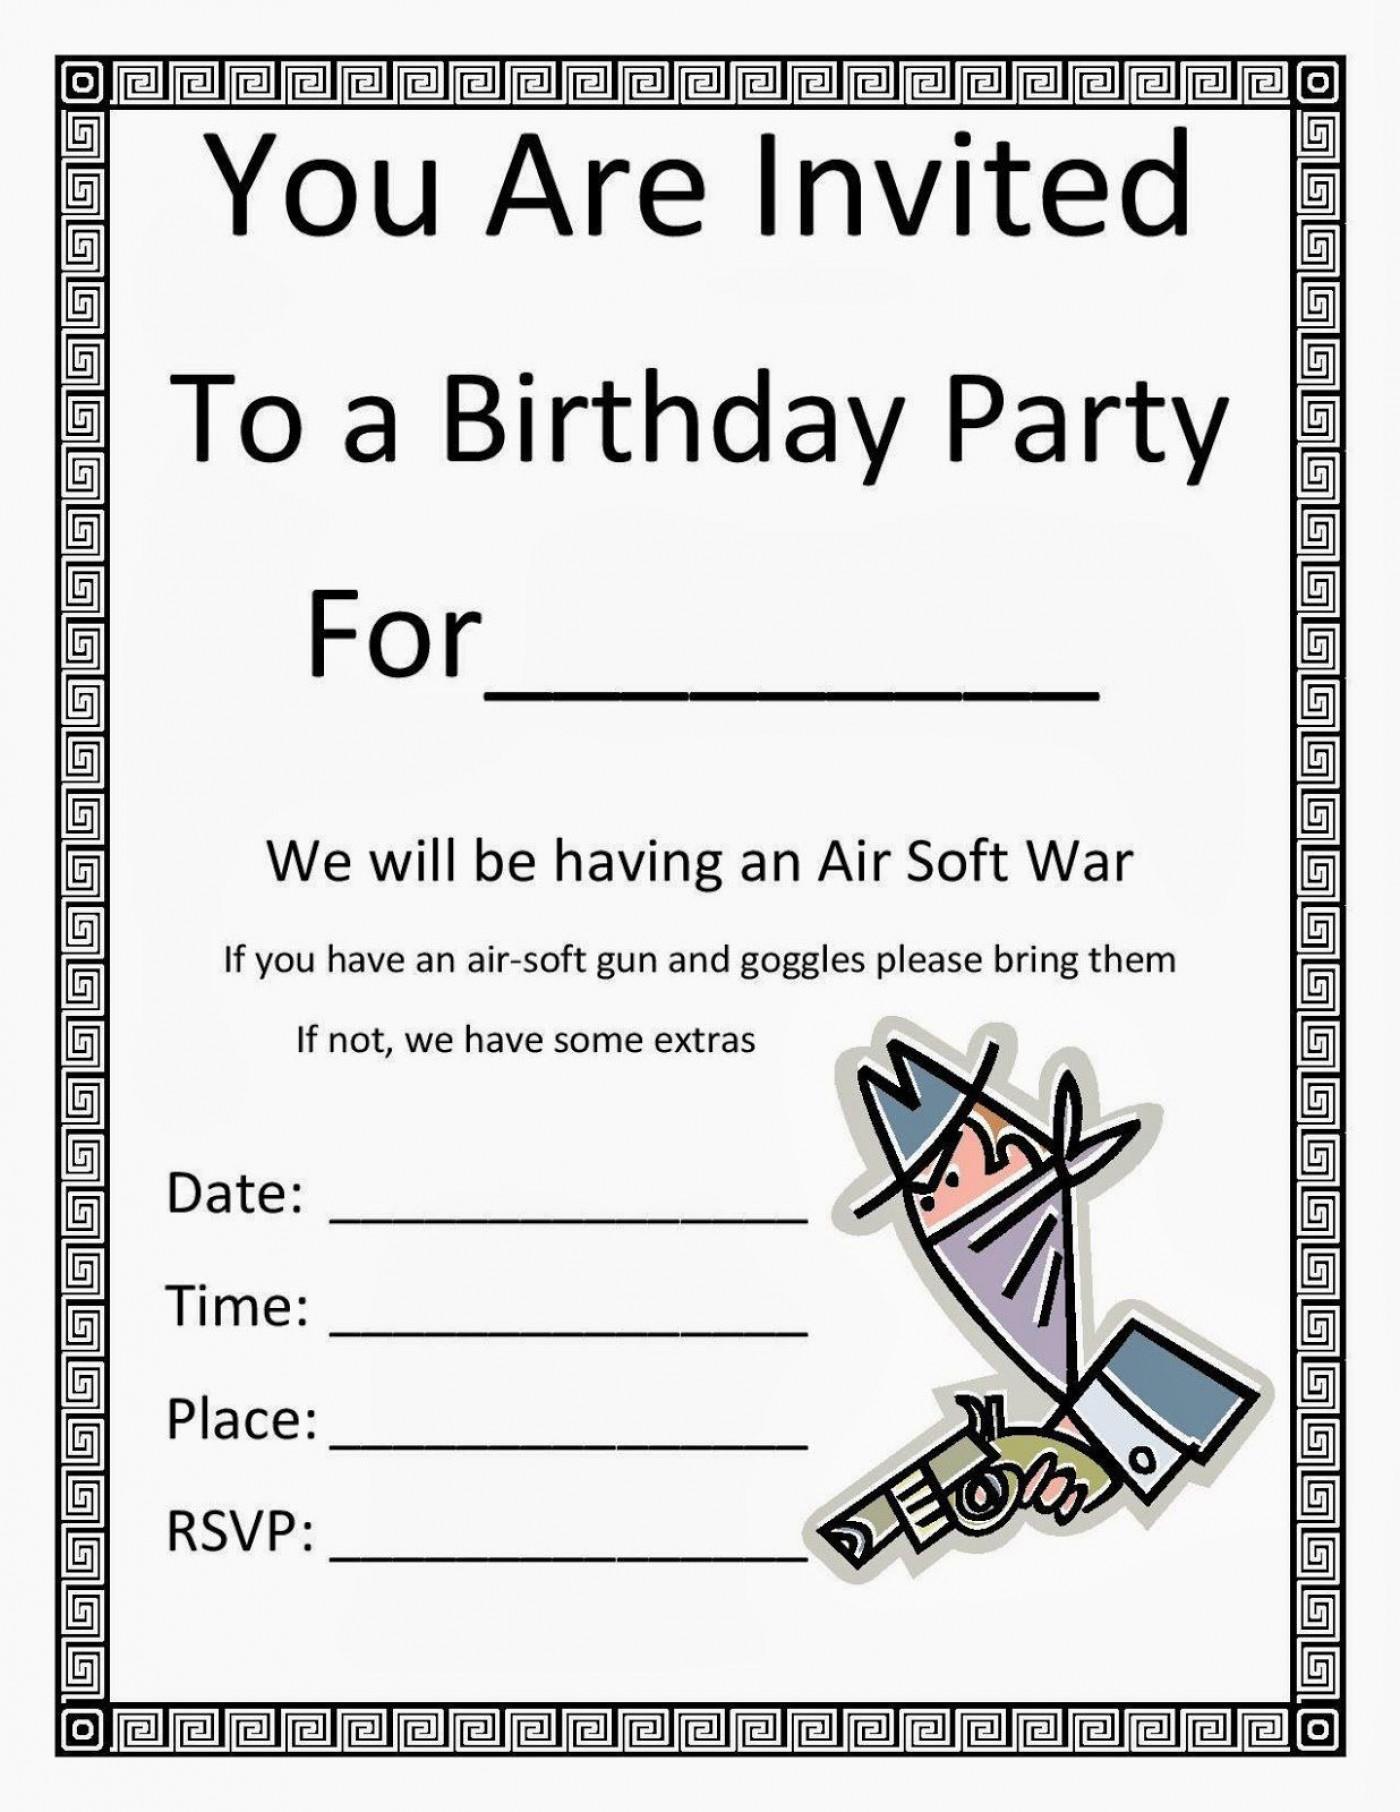 000 Marvelou Microsoft Word Birthday Invitation Template Sample  Editable 50th 60th1400